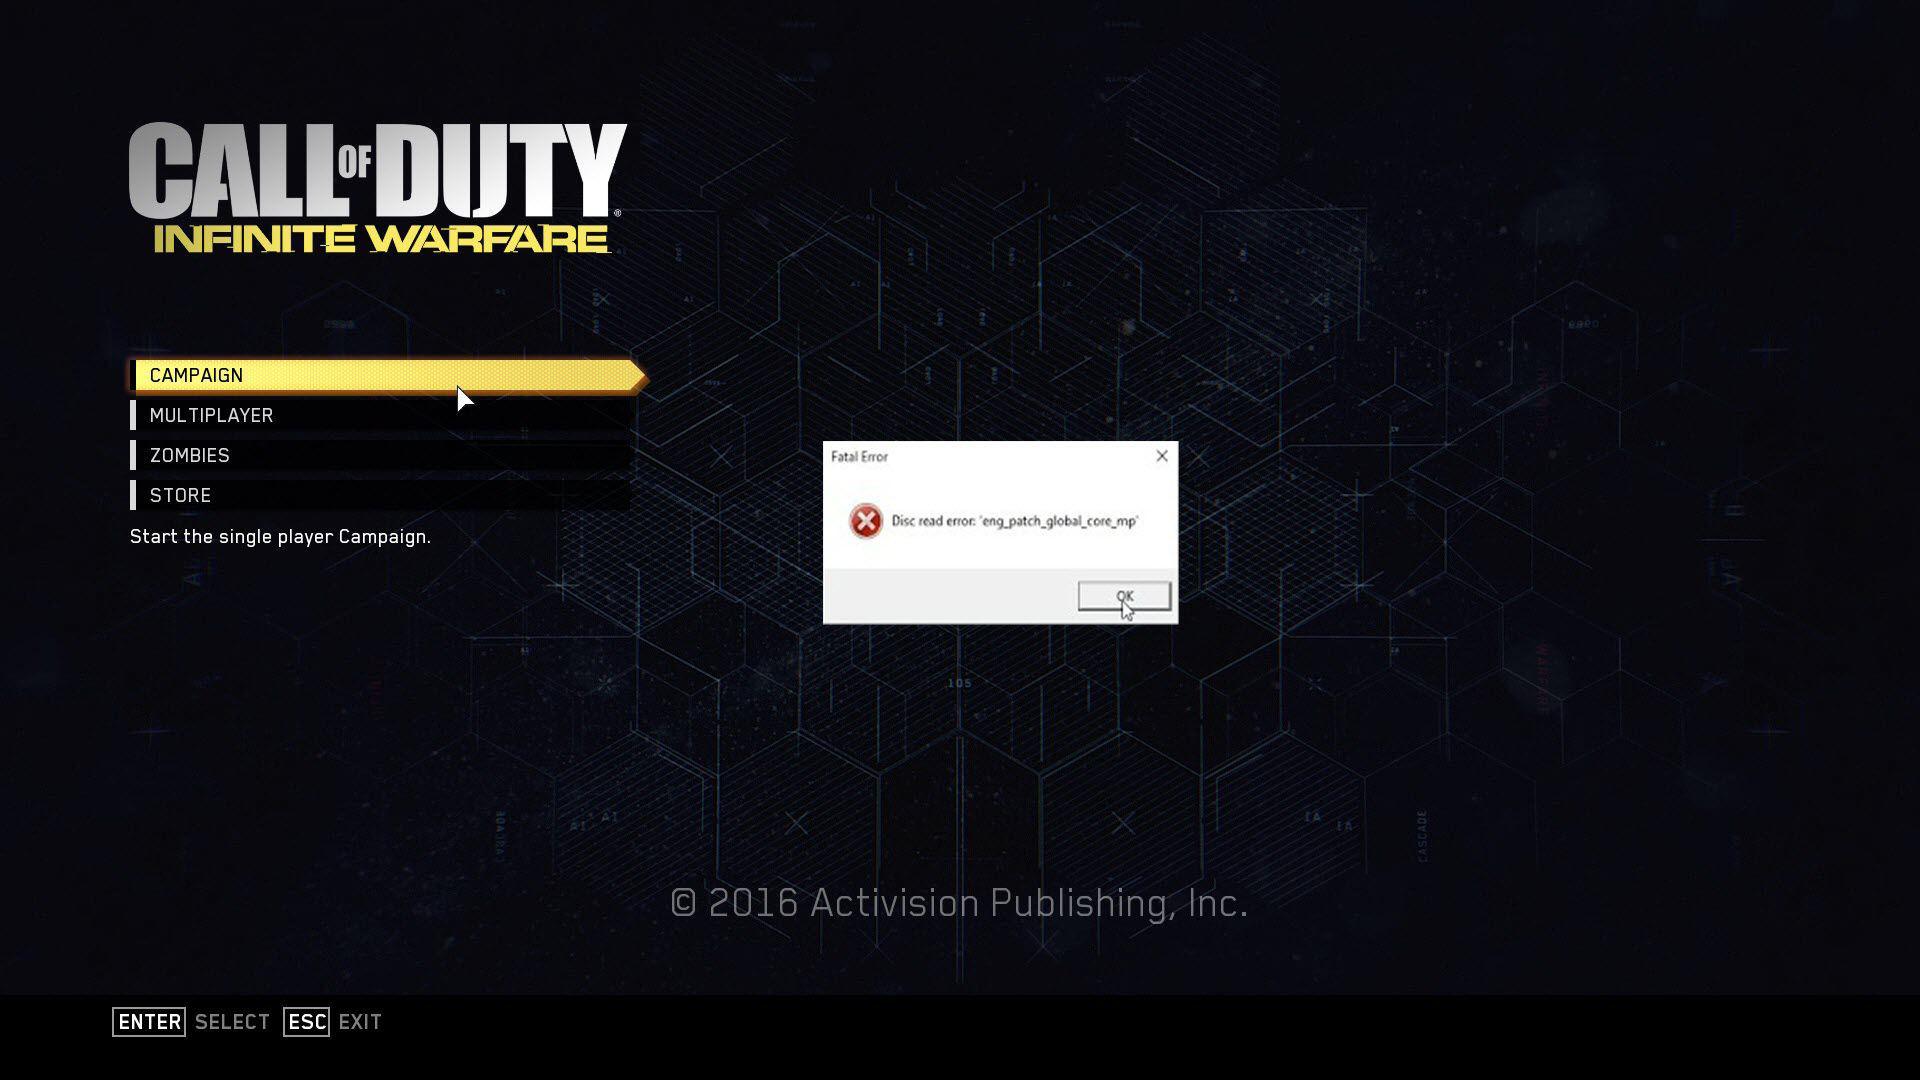 Call of Duty Infinite Warfare Disc Read Error: Eng_patch_global_core_mp